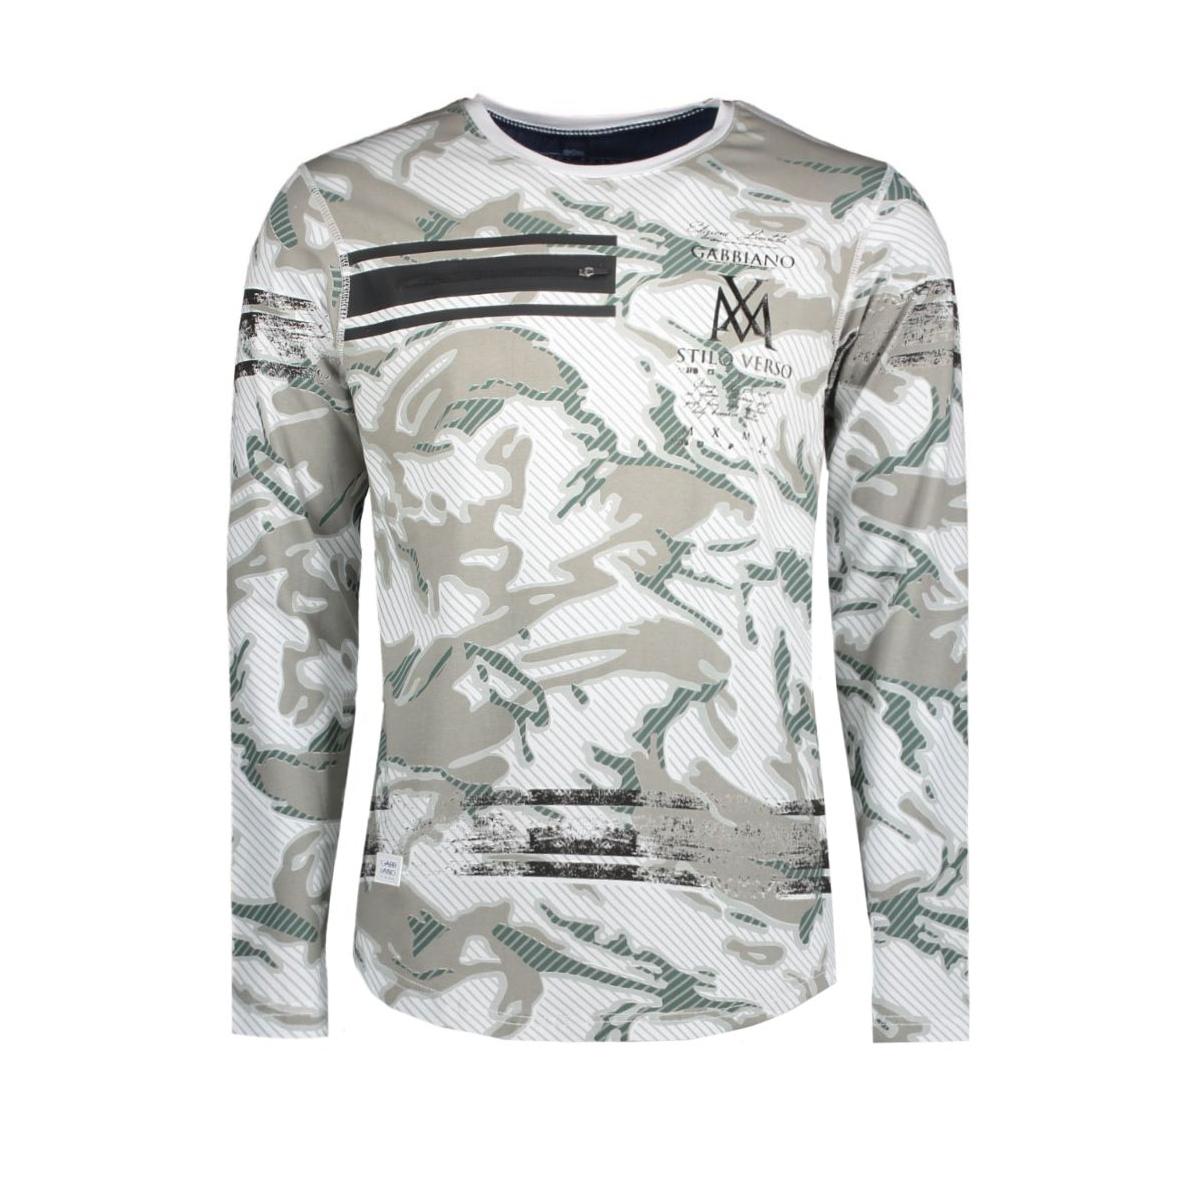 3008 gabbiano t-shirt wit